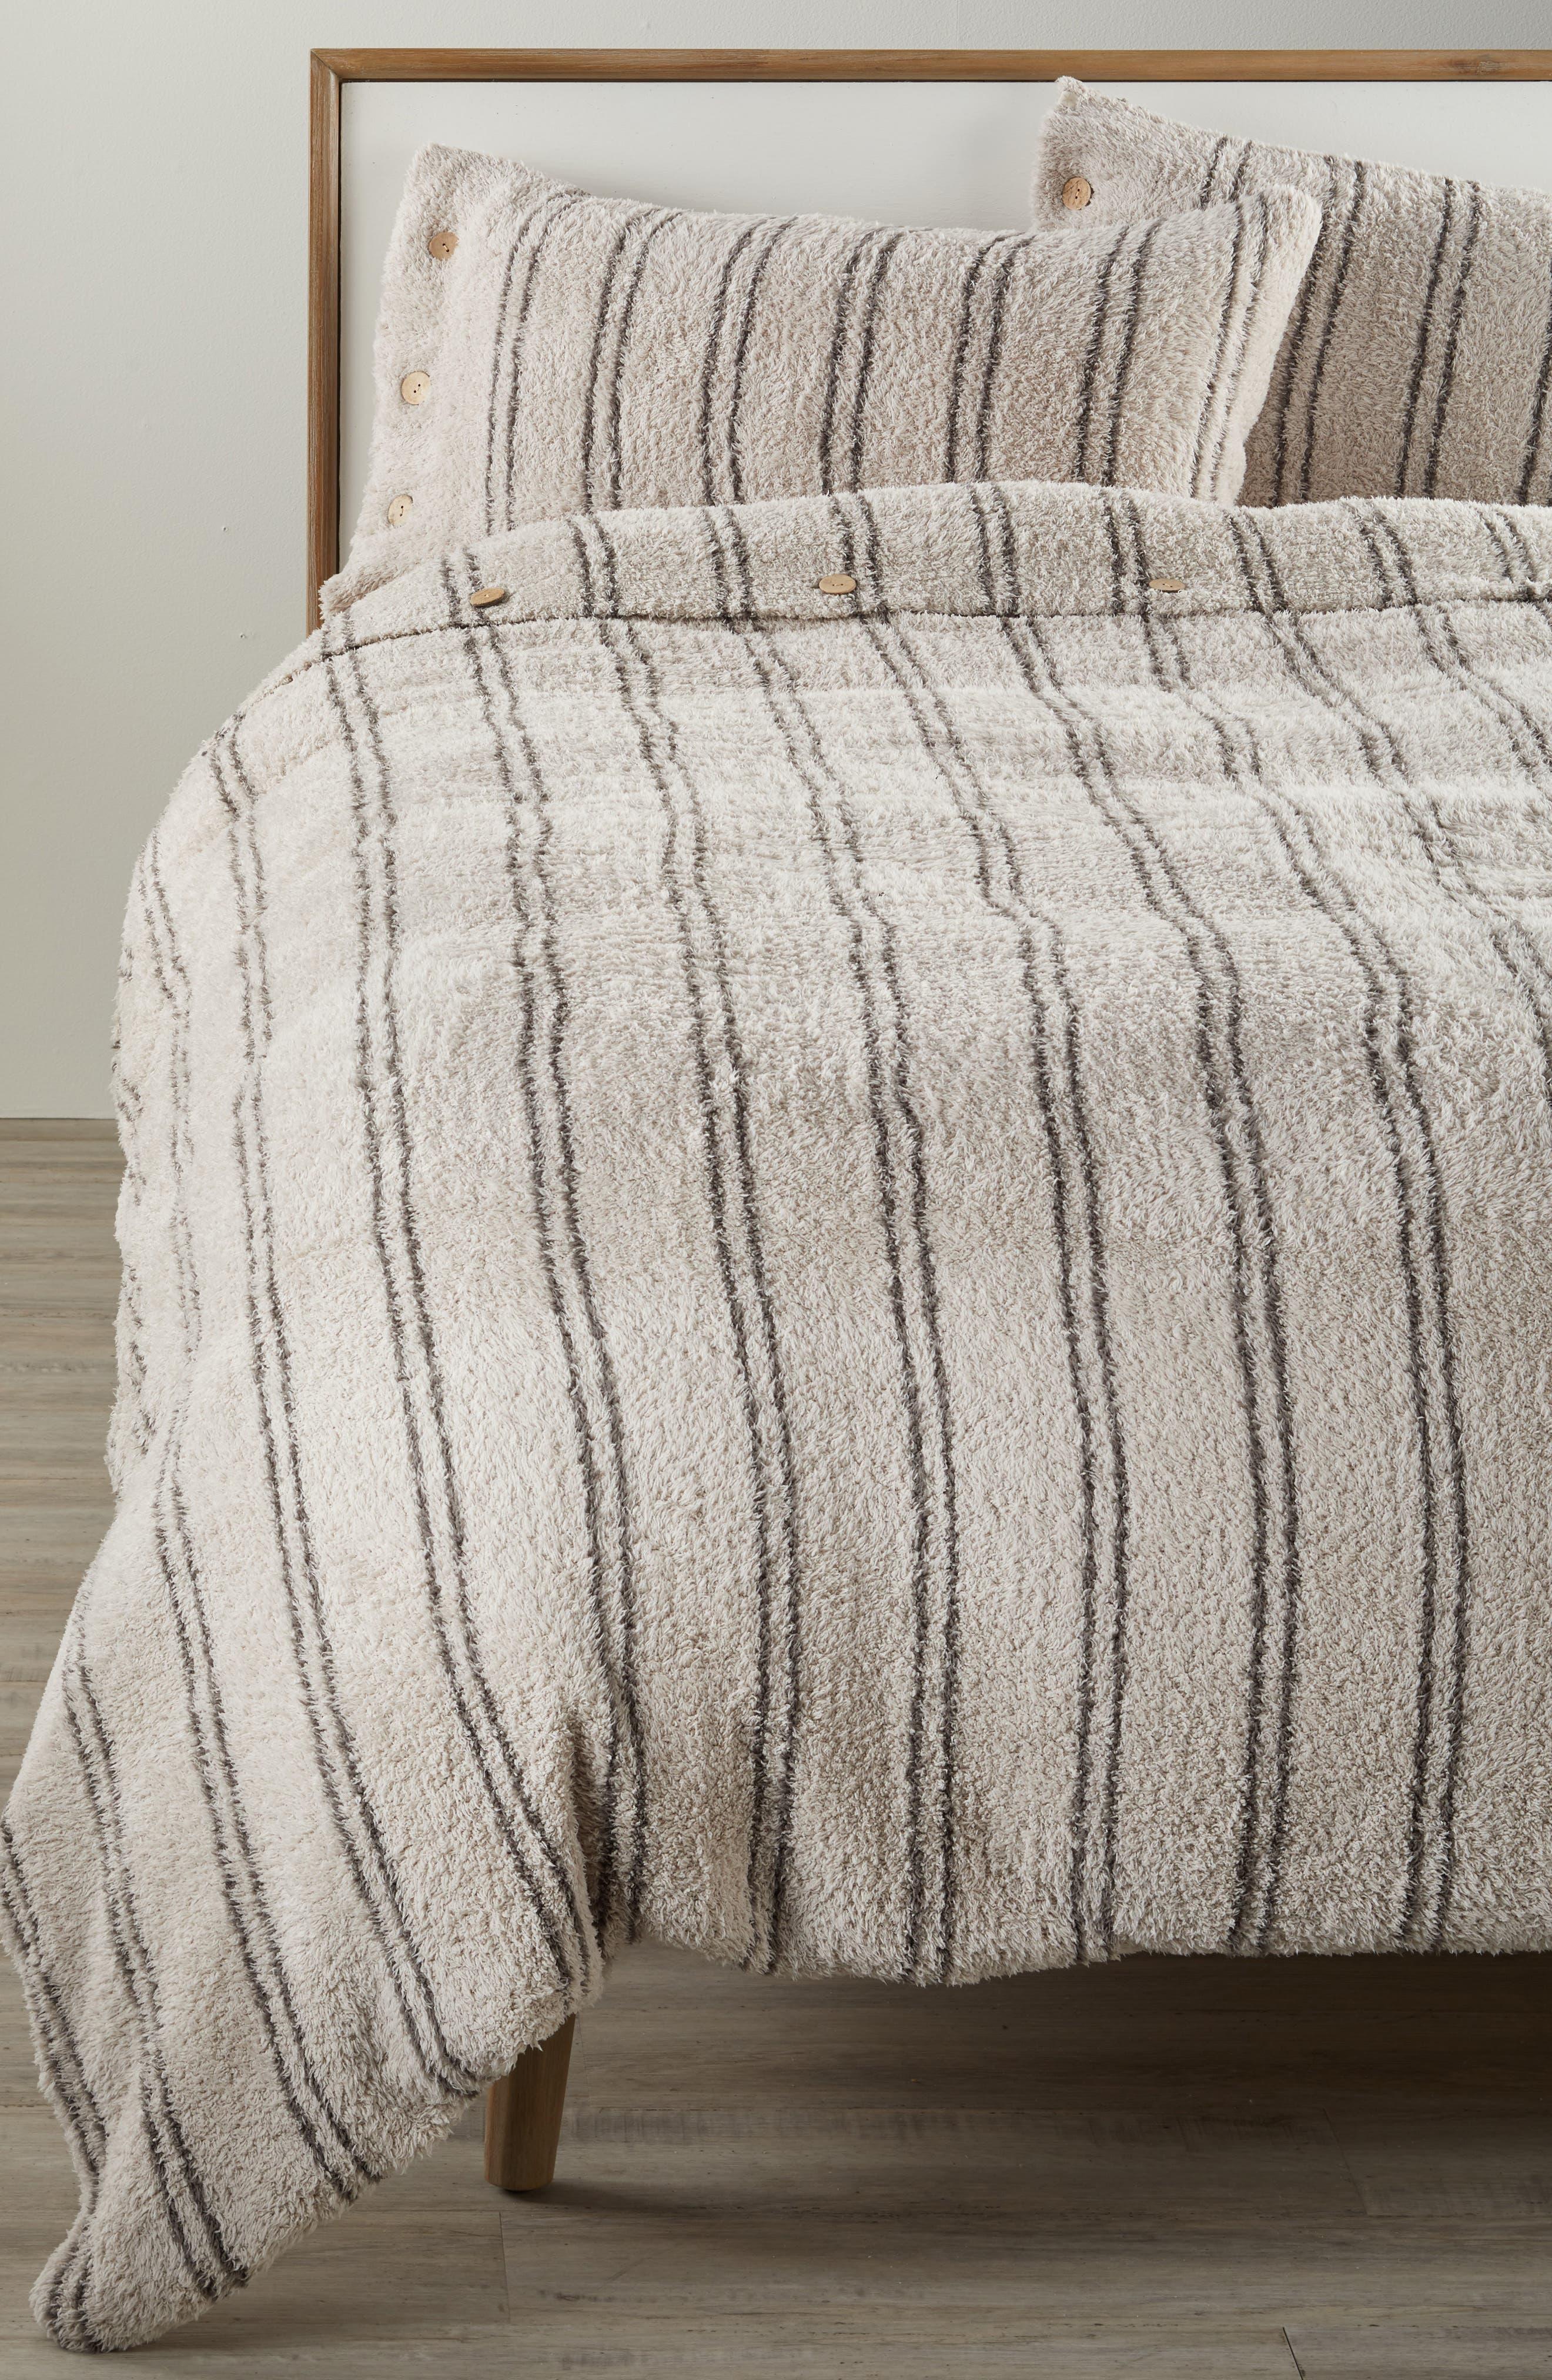 CozyChic<sup>®</sup> Vertical Stripe Duvet Cover & Shams,                             Main thumbnail 1, color,                             STONE/ CHARCOAL